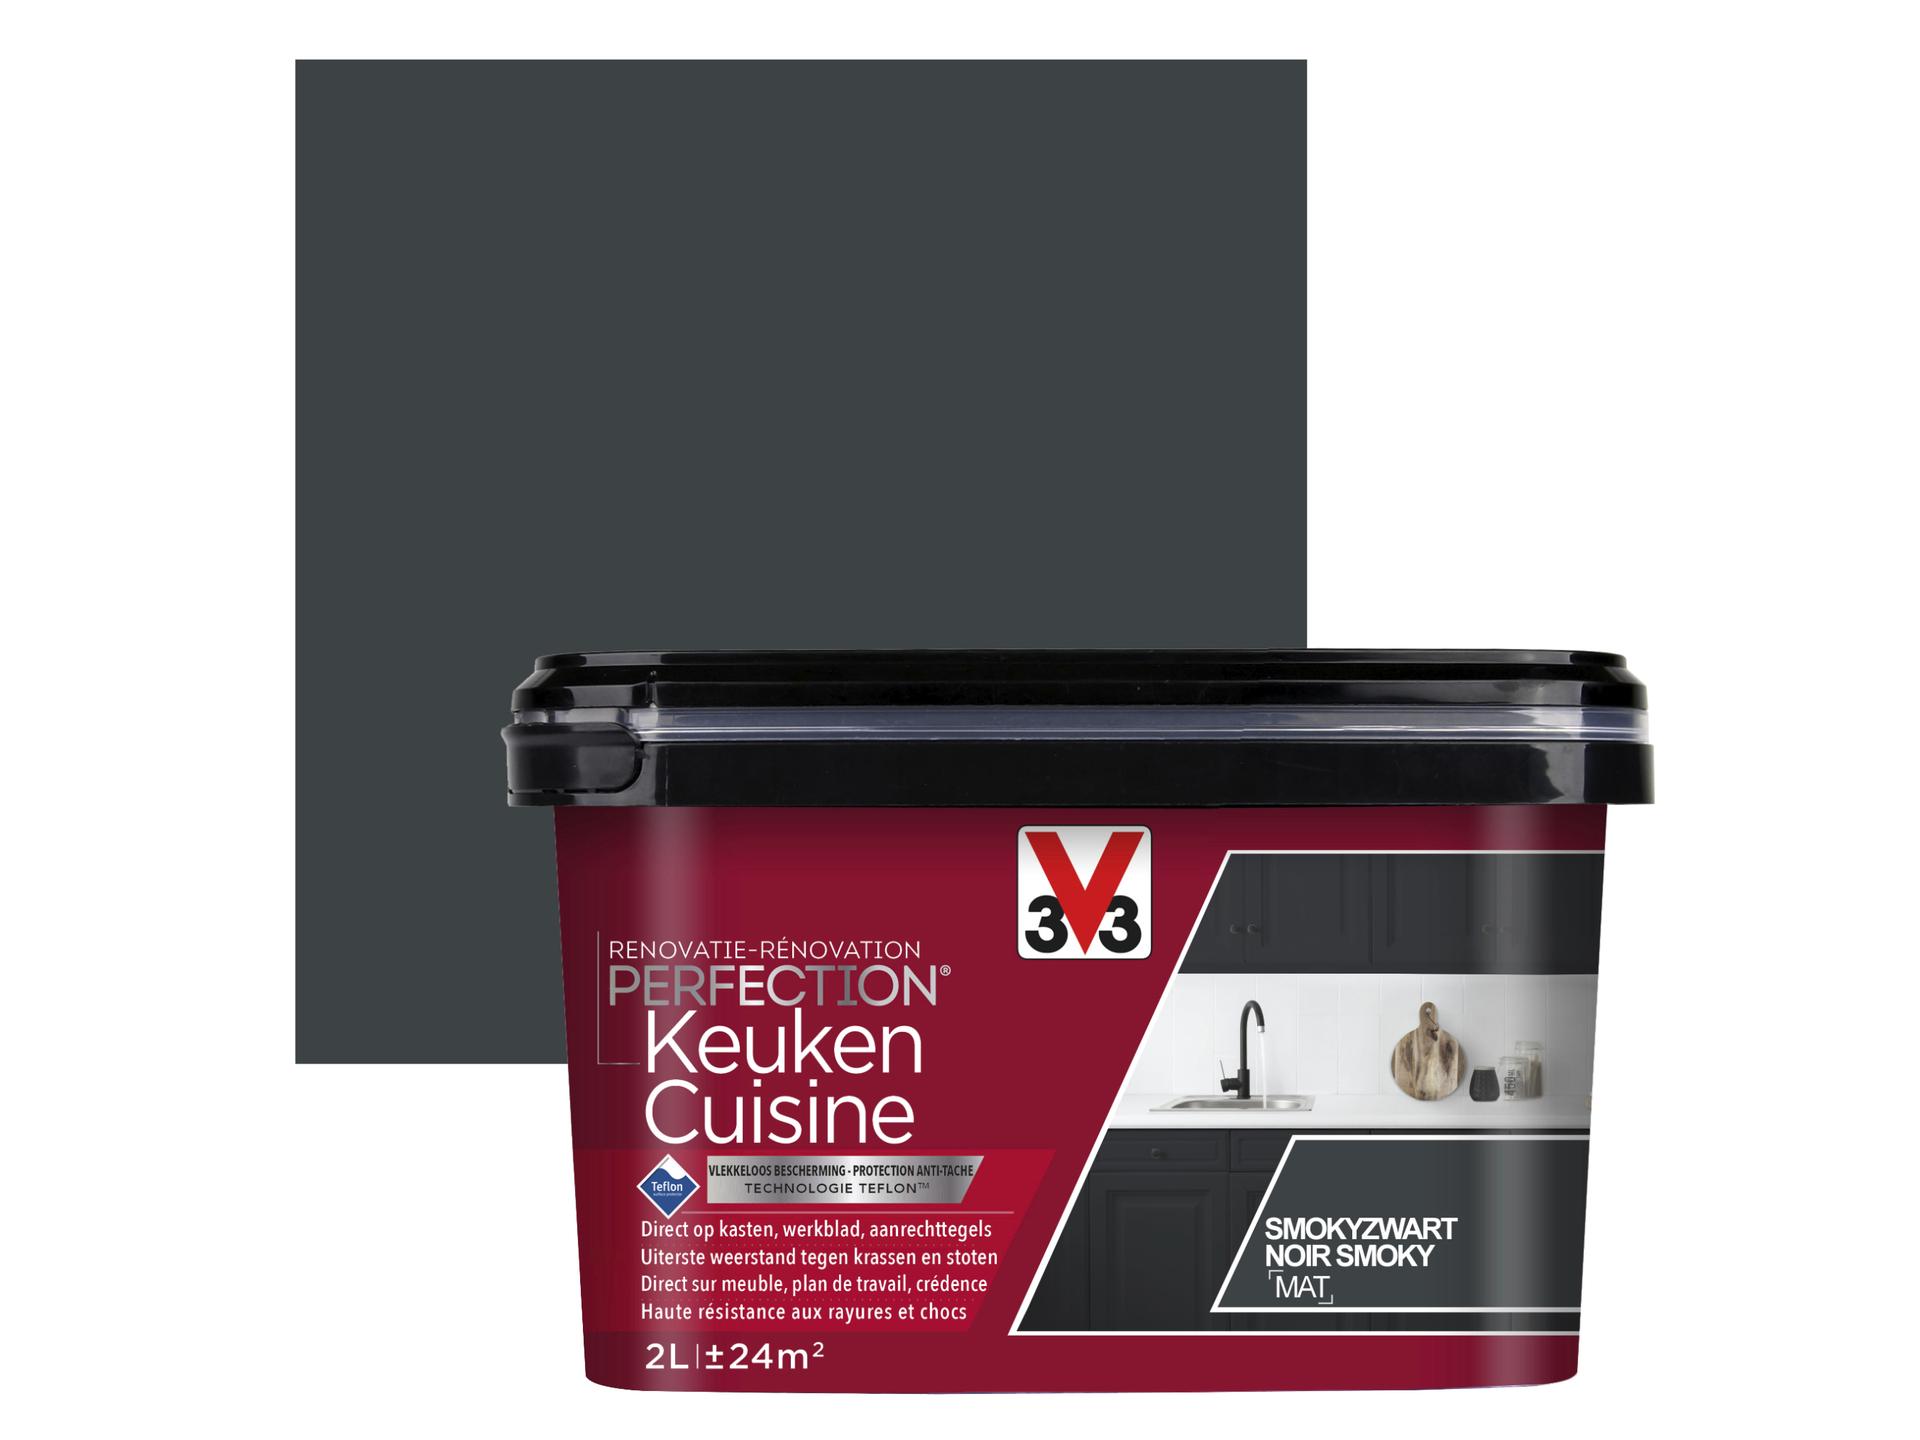 Nettoyer Meuble Cuisine Mat v33 perfection peinture rénovation cuisine mat 2l noir smoky